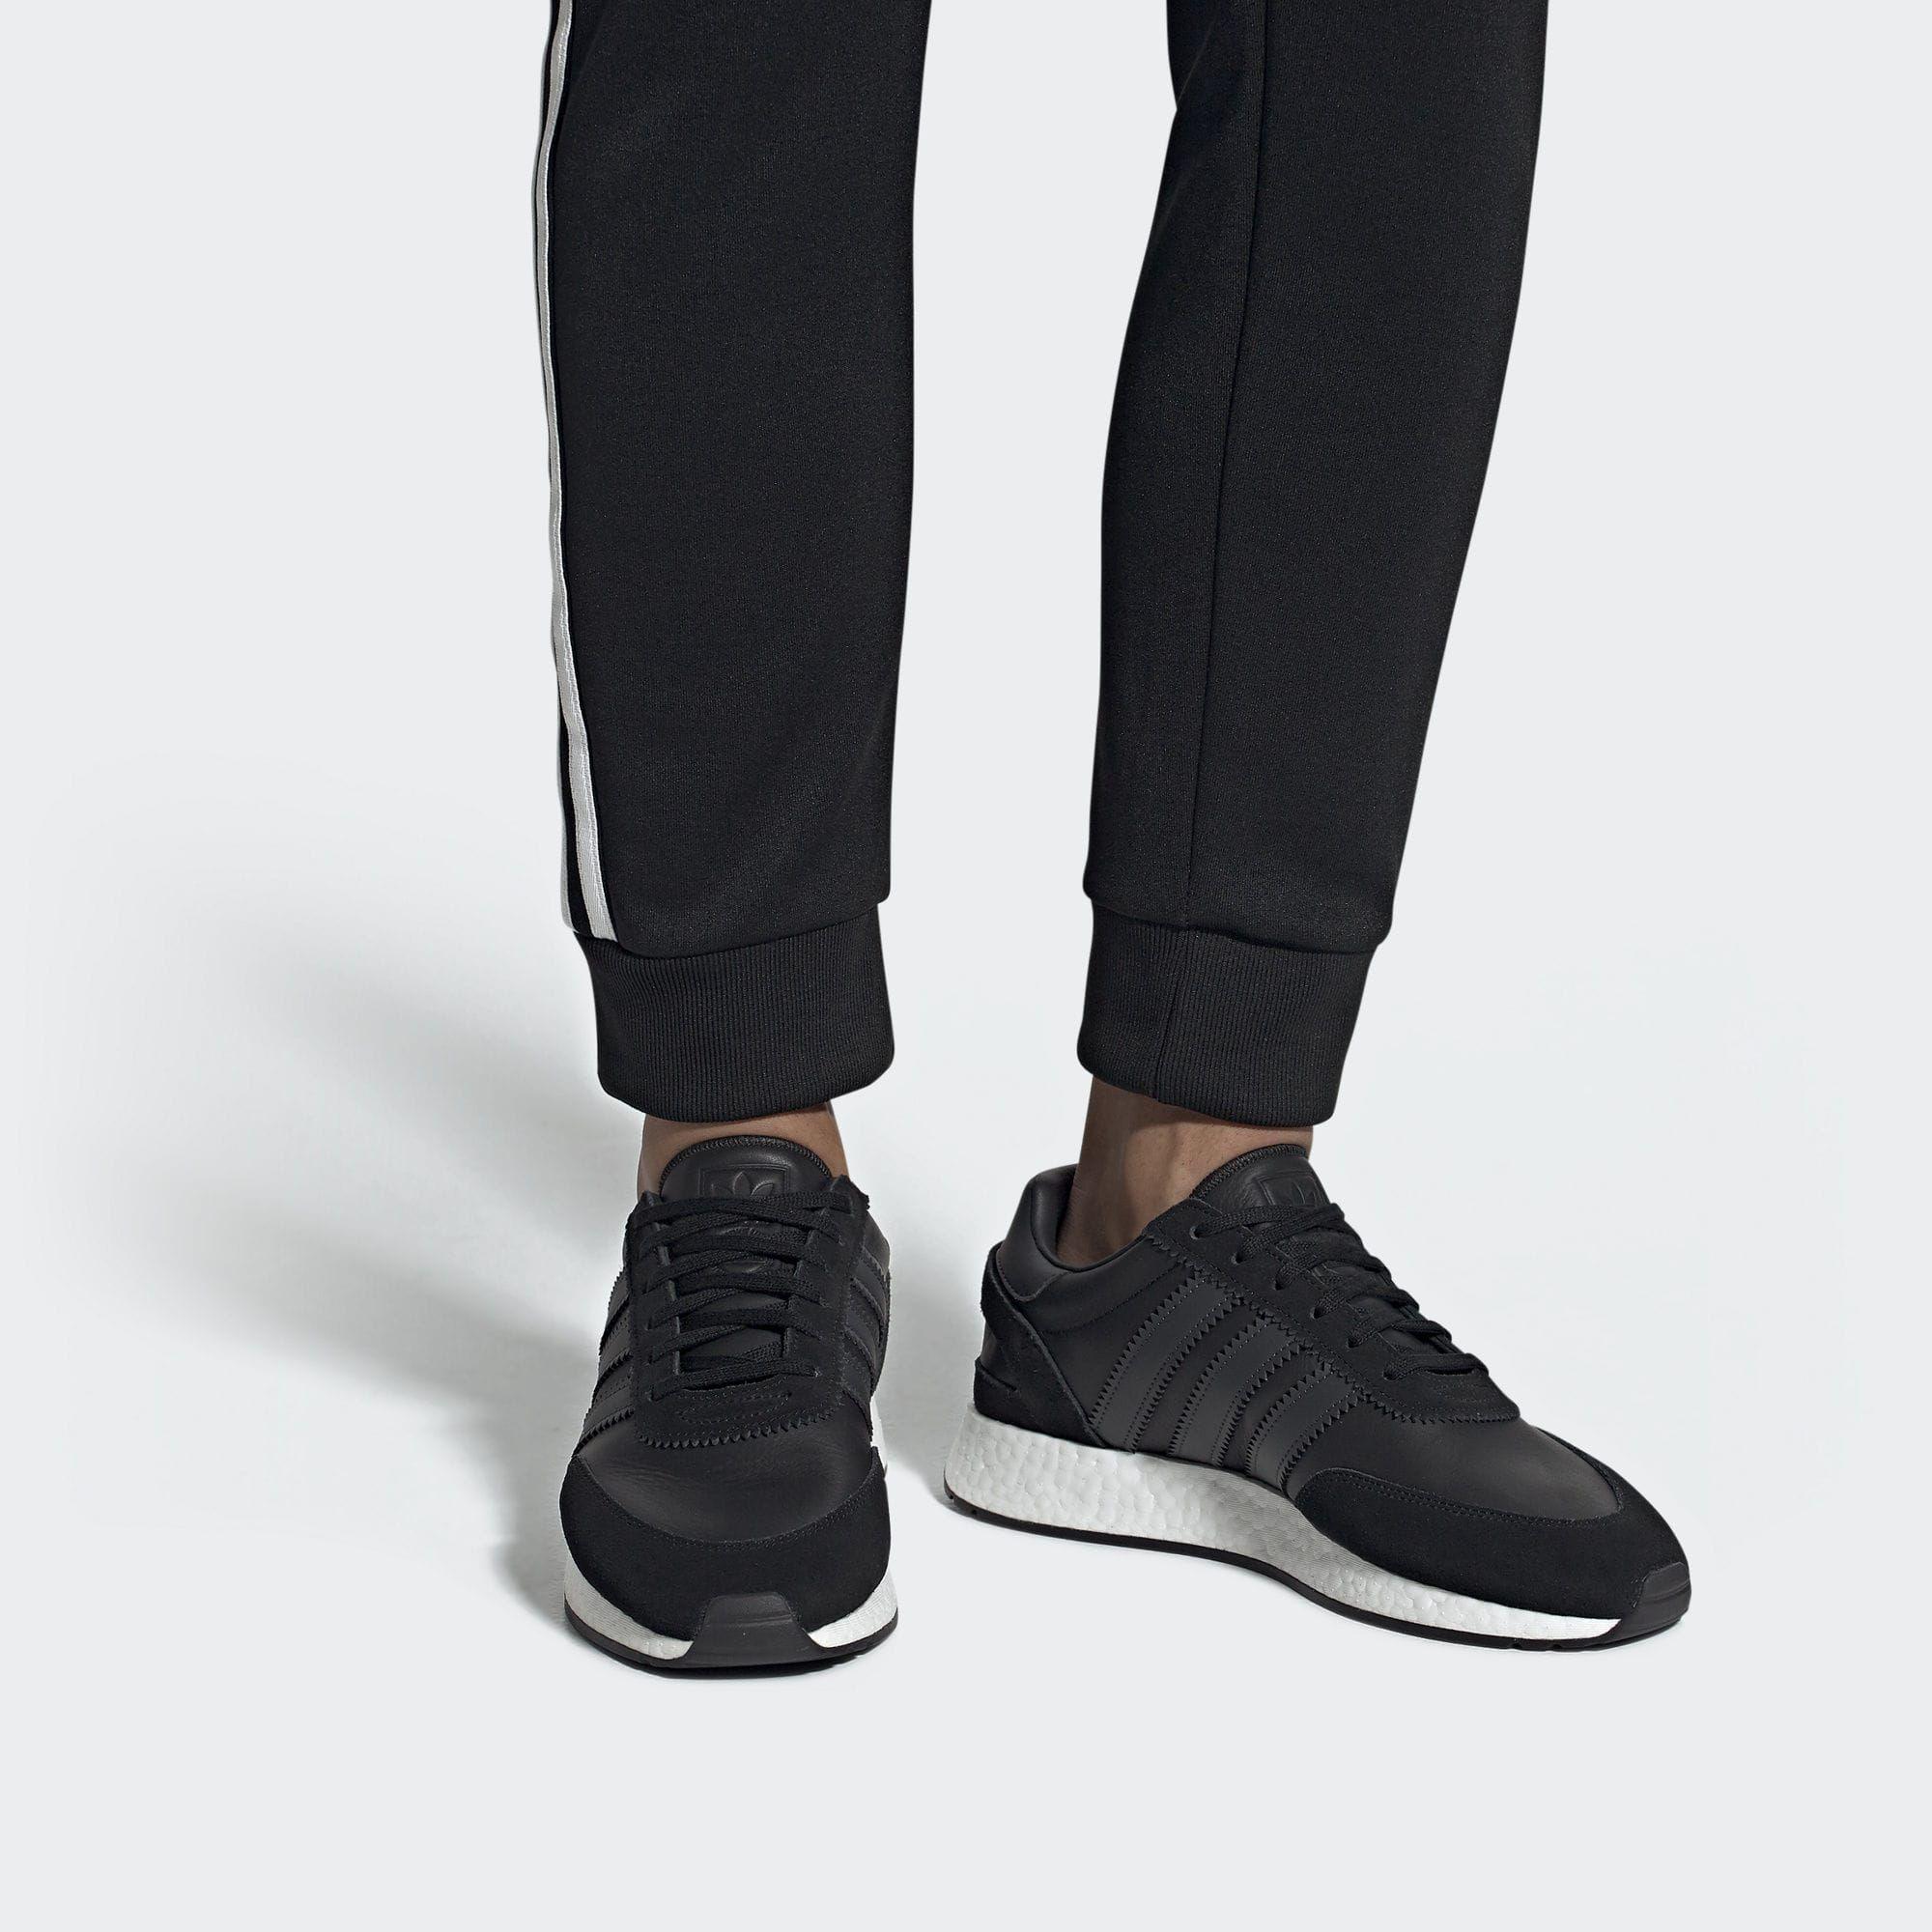 Adidas Originals Sneaker I 5923 Herren Schwarz Grosse 42 5 43 Adidas Originals Sneaker Turnschuhe Und Manner Turnschuhe